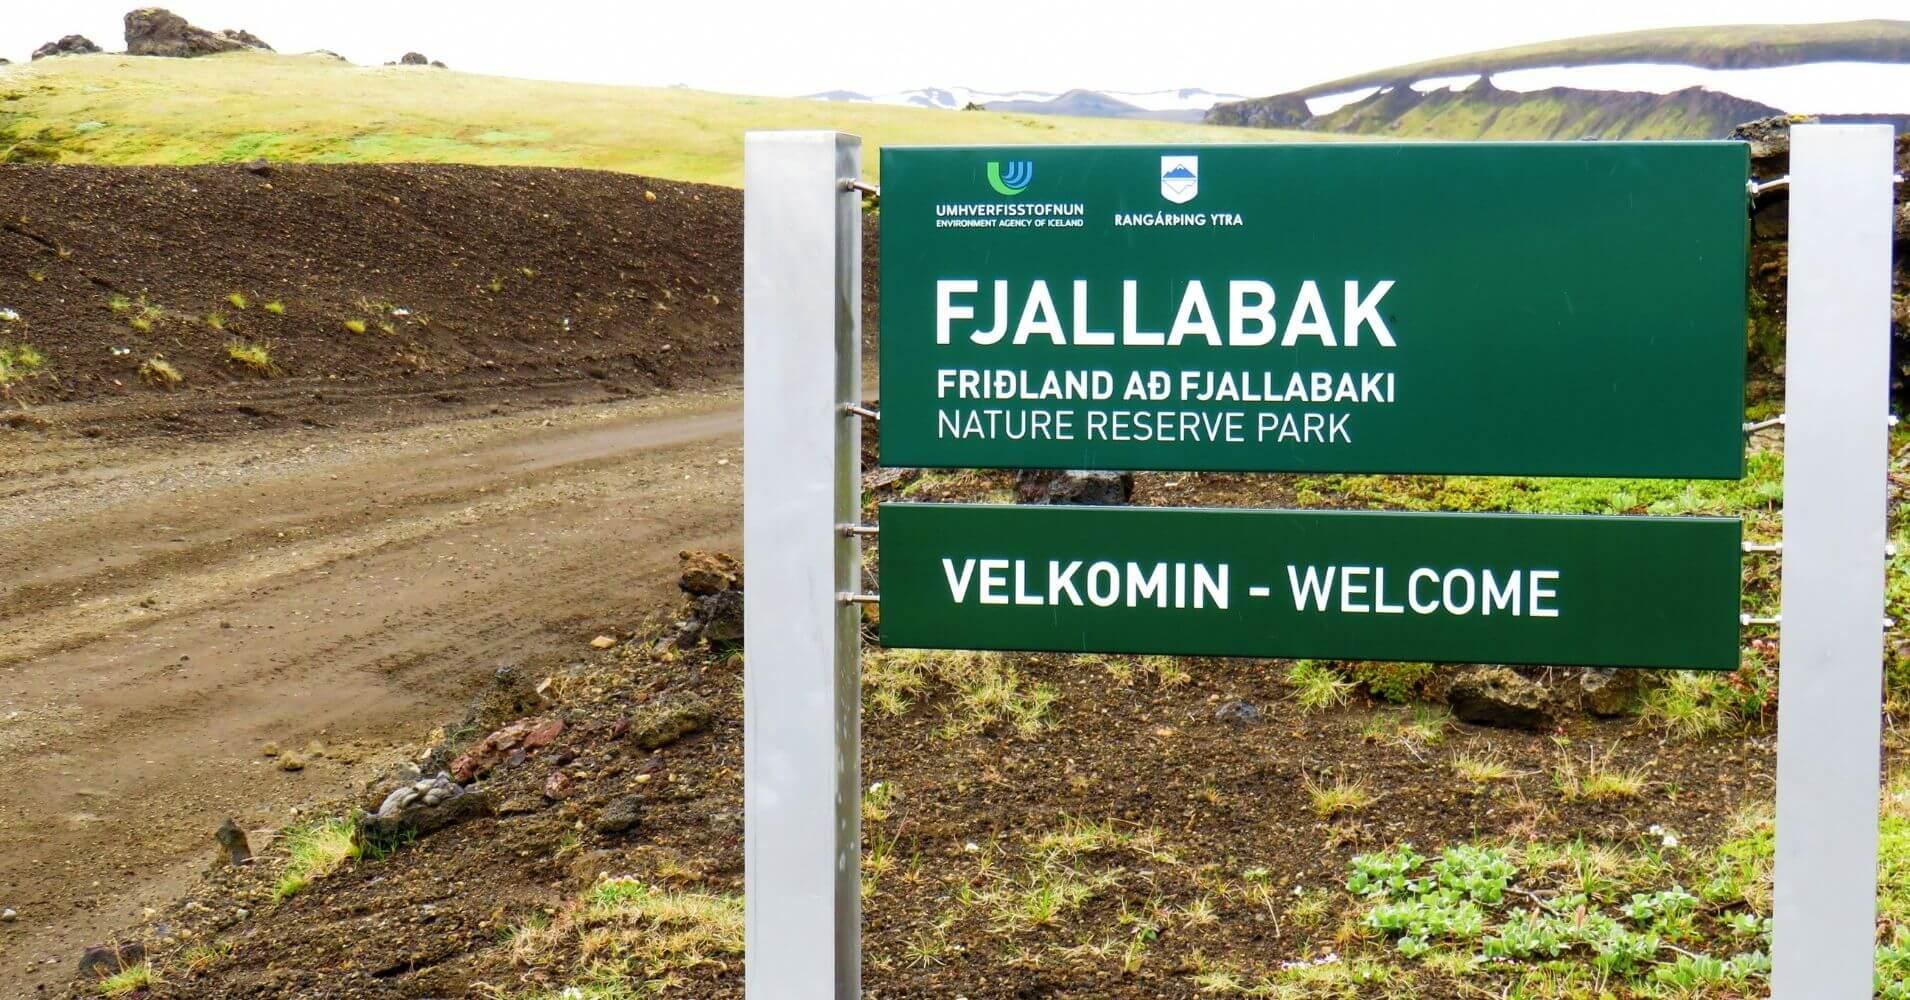 Reserva Natural de Fjallabak. Landmannalaugar Tierras Altas de Islandia.